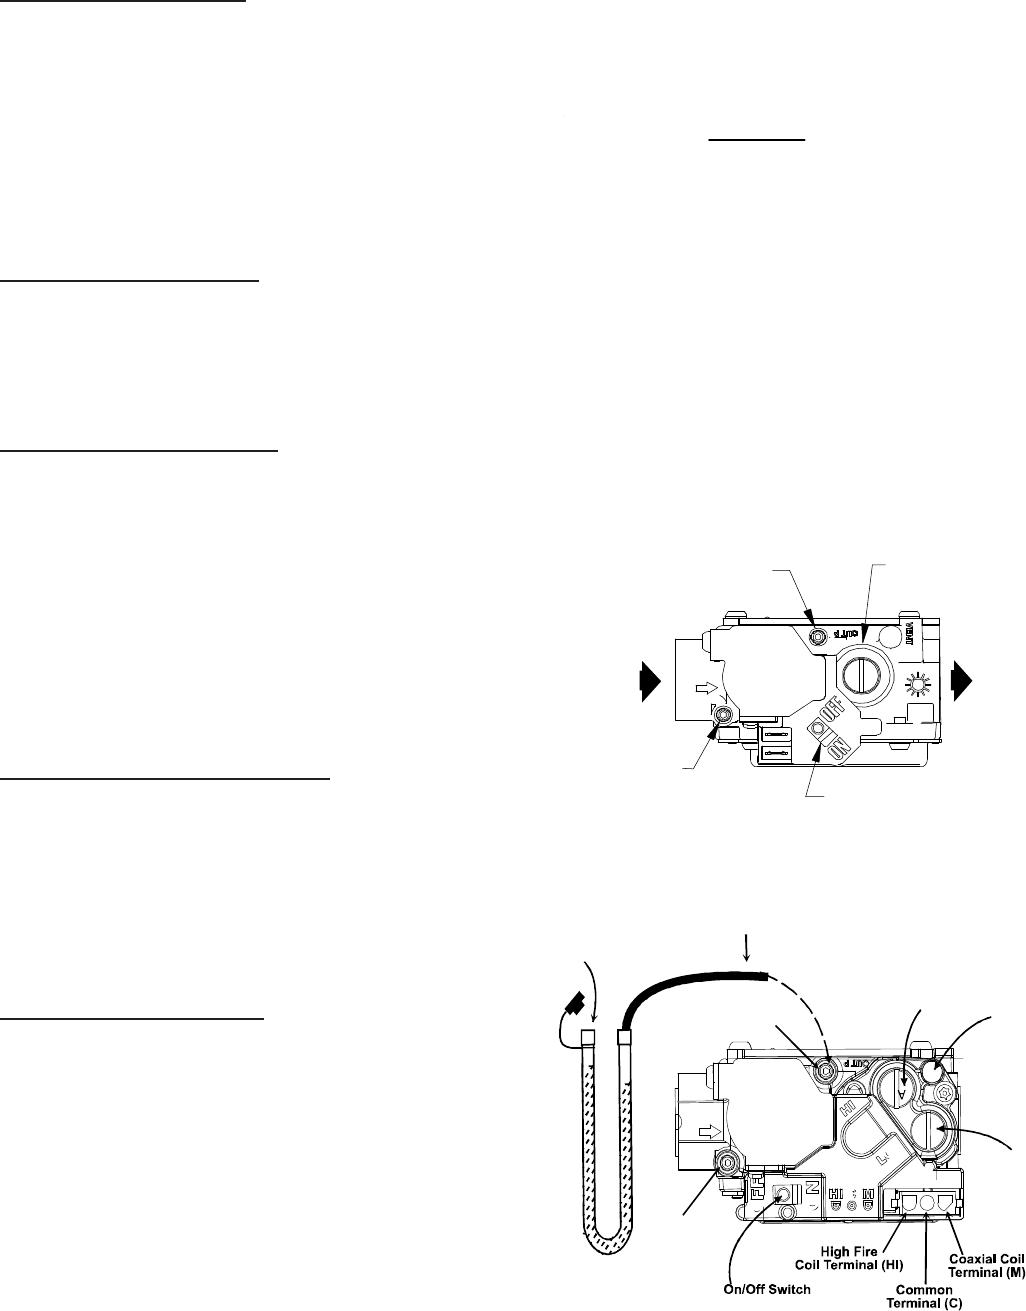 goodman mfg mercial heating and cooling gas unit cpg series users Goodman Gas Furnace Wiring Diagram 21